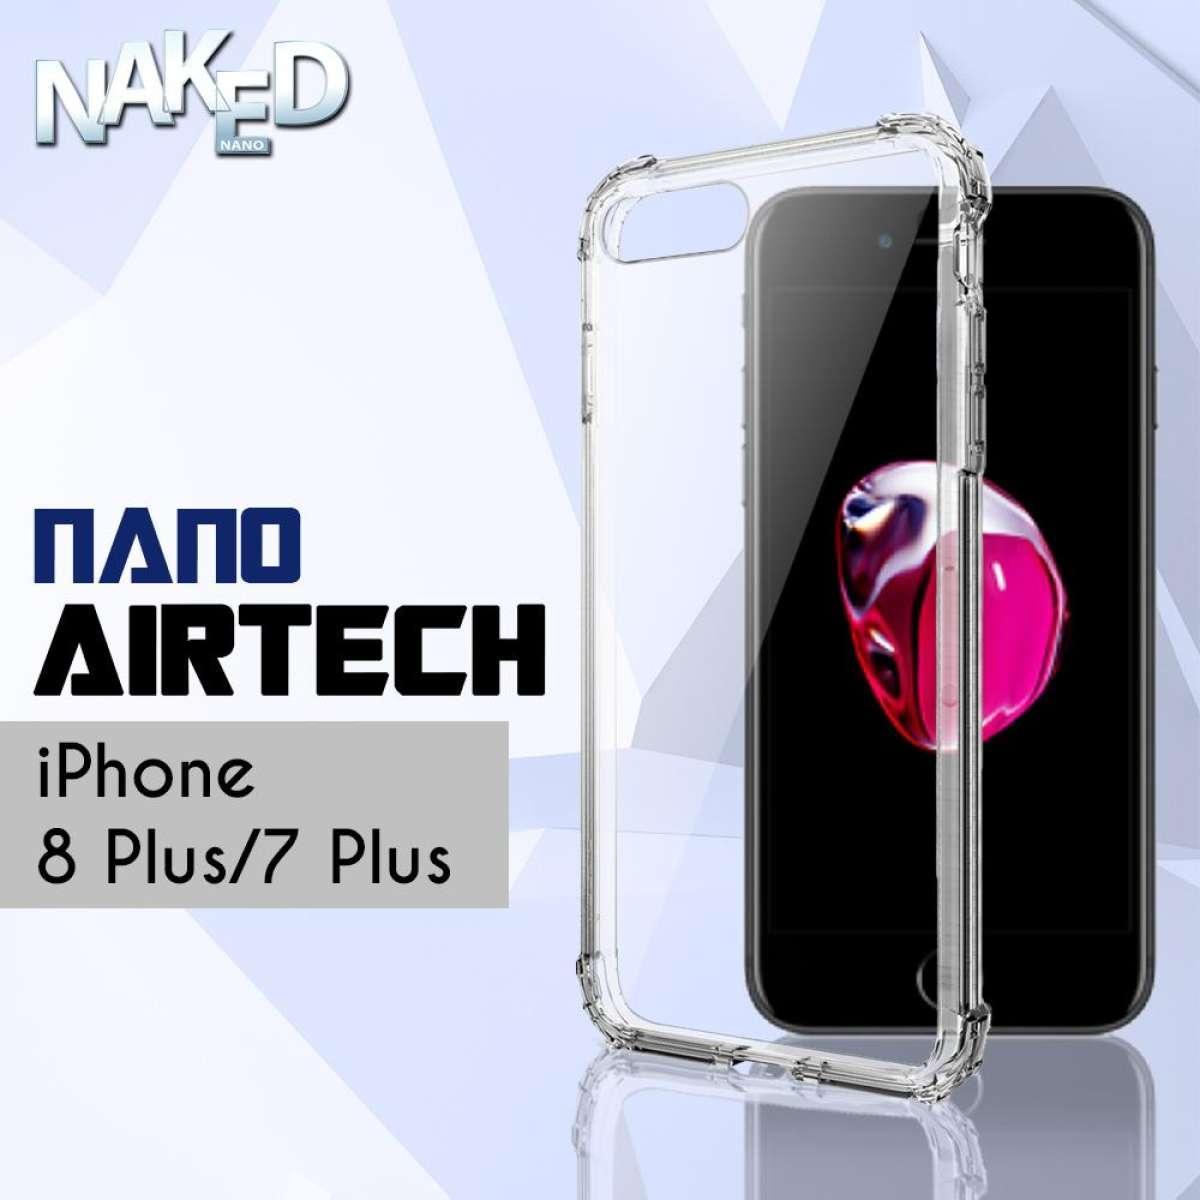 Nano AirTech Protective Case iPhone 8 Plus/7 Plus Shock Absorbing TPU Casing